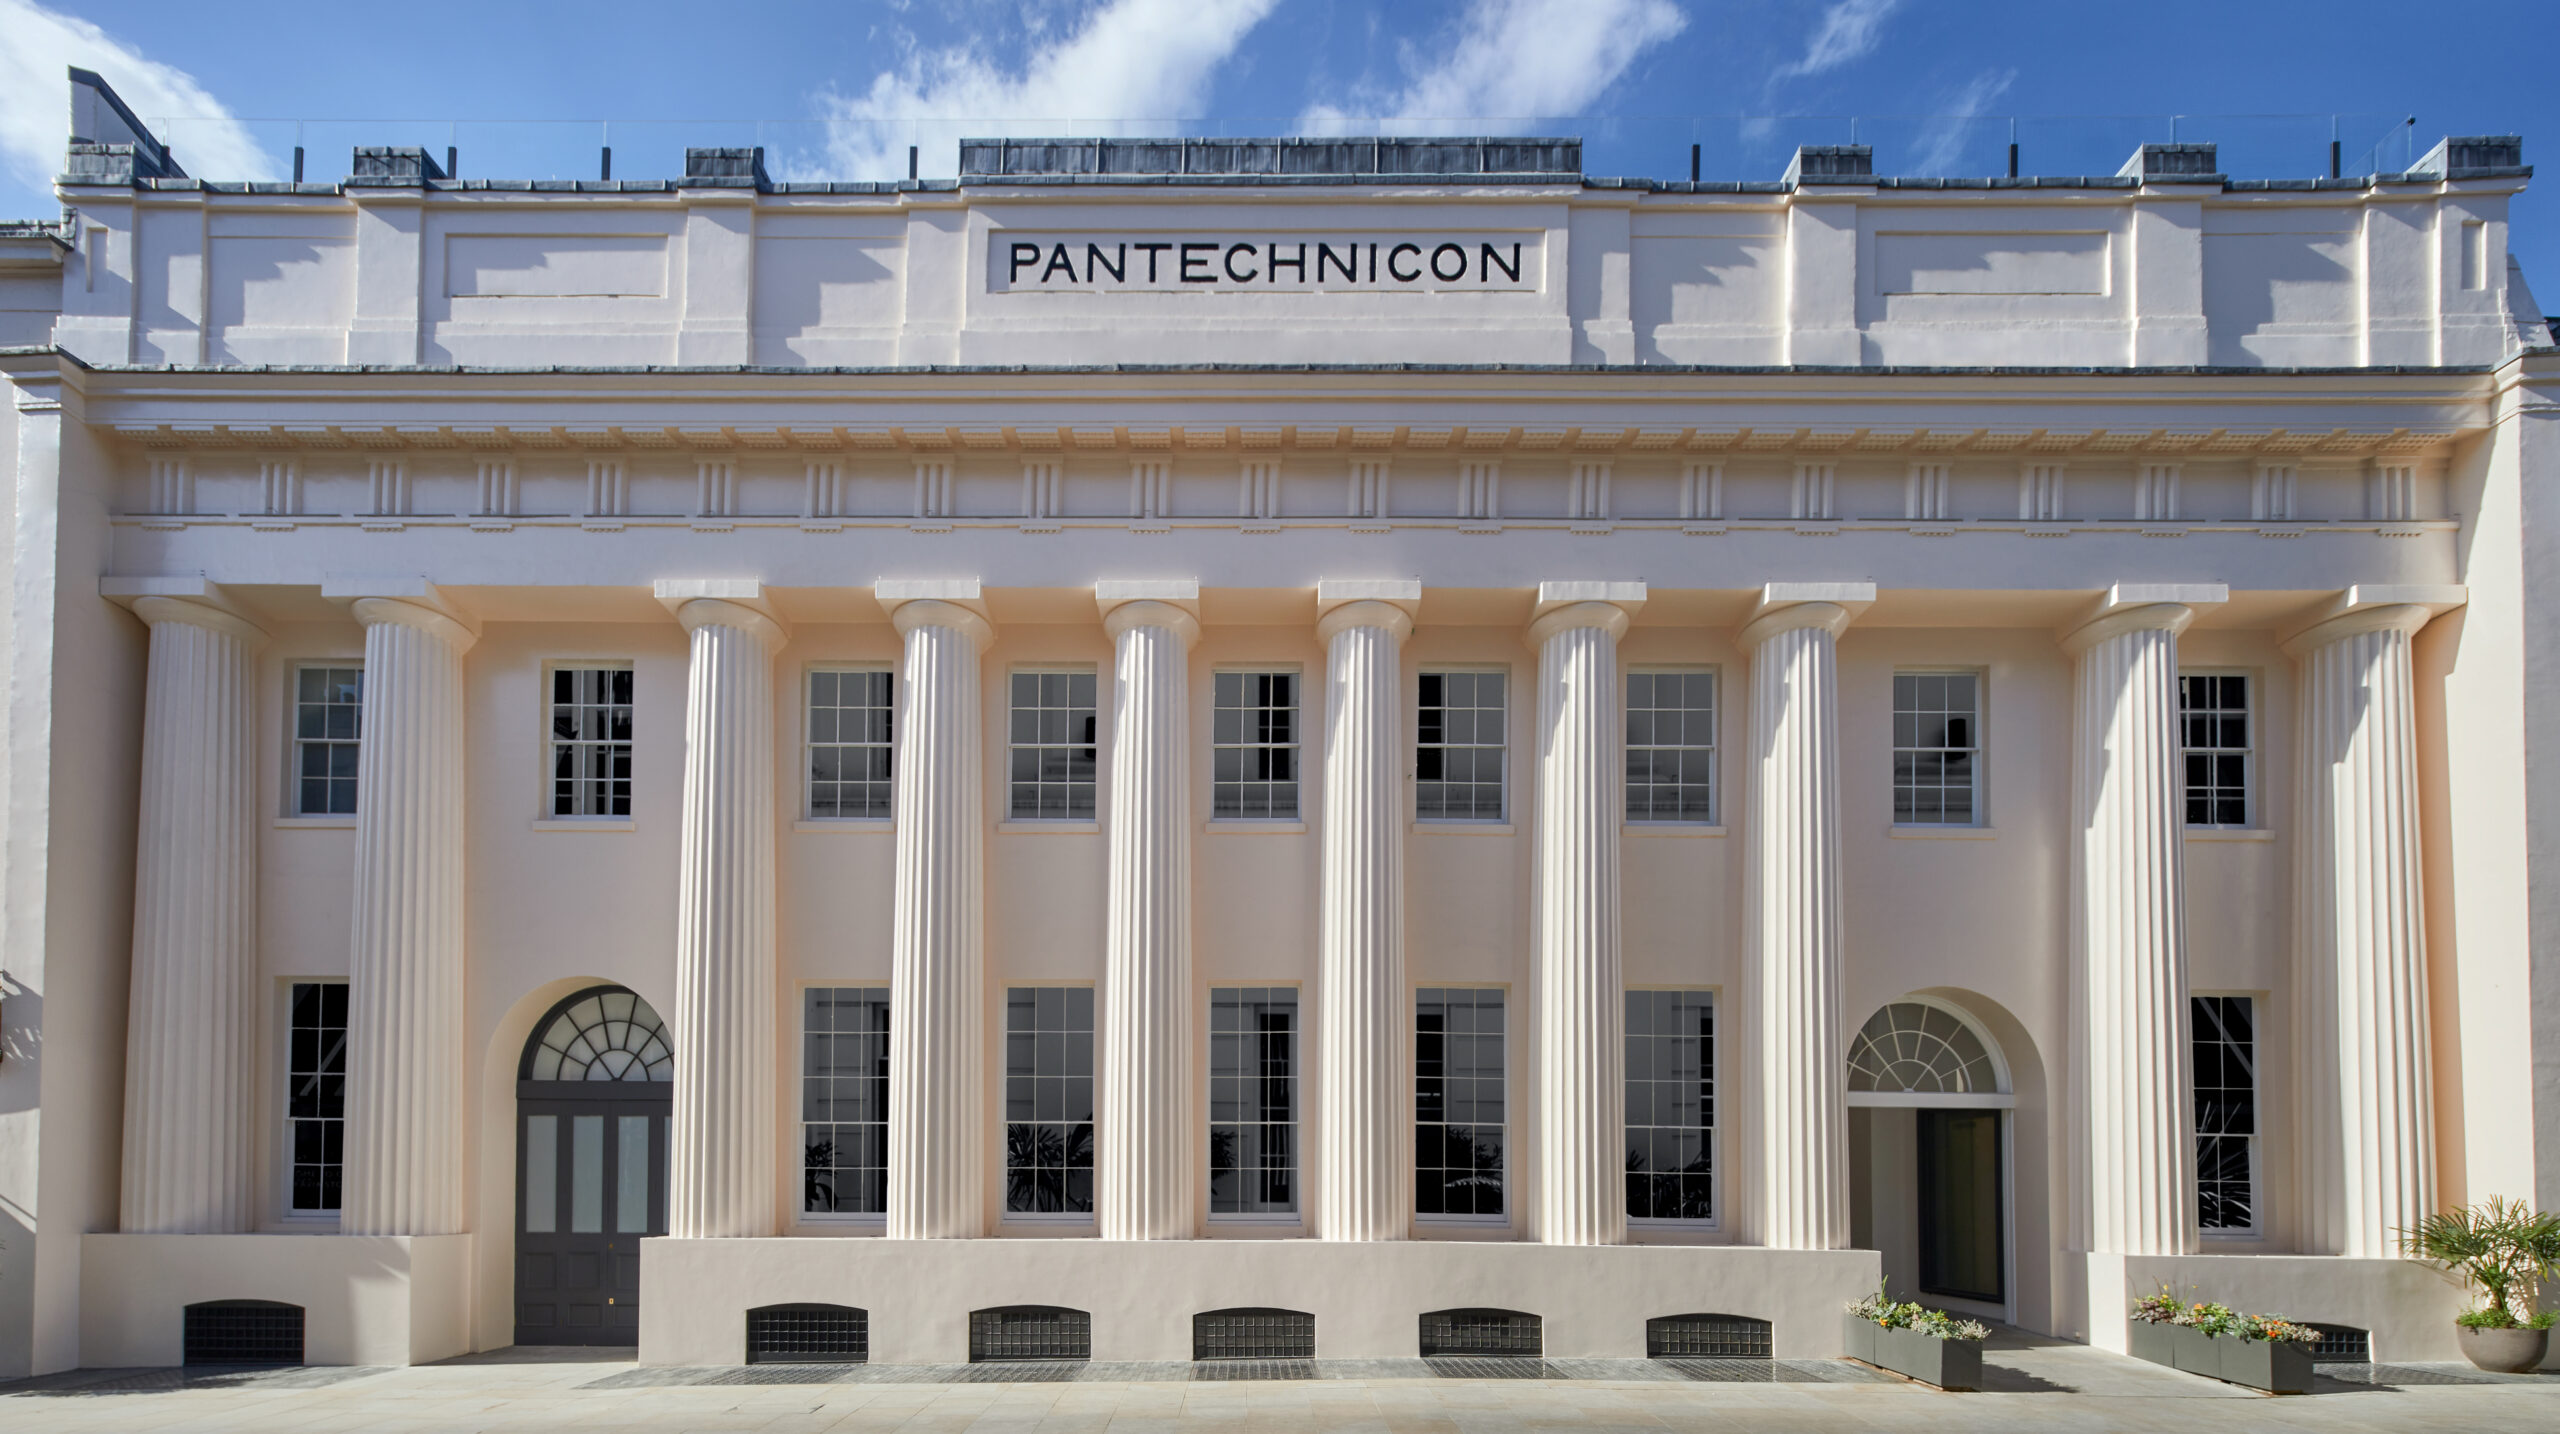 Pantechnicon concept store exterior